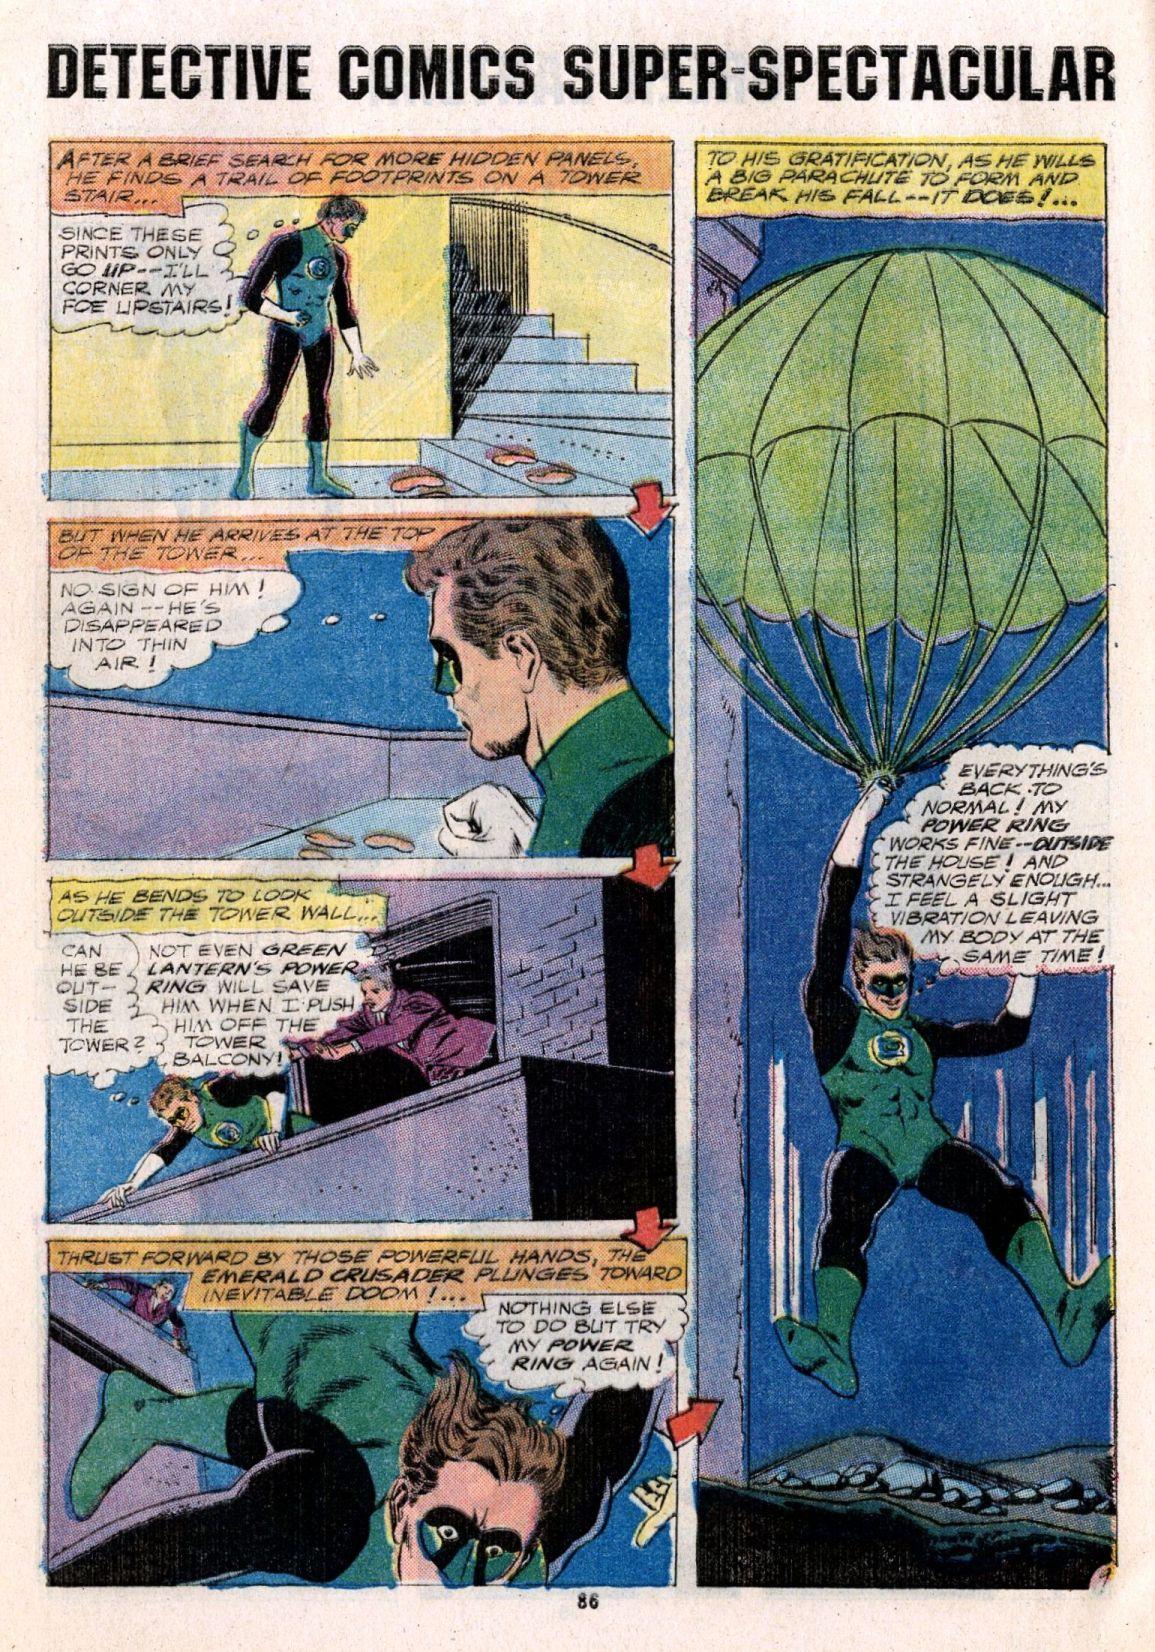 Detective Comics (1937) 438 Page 86